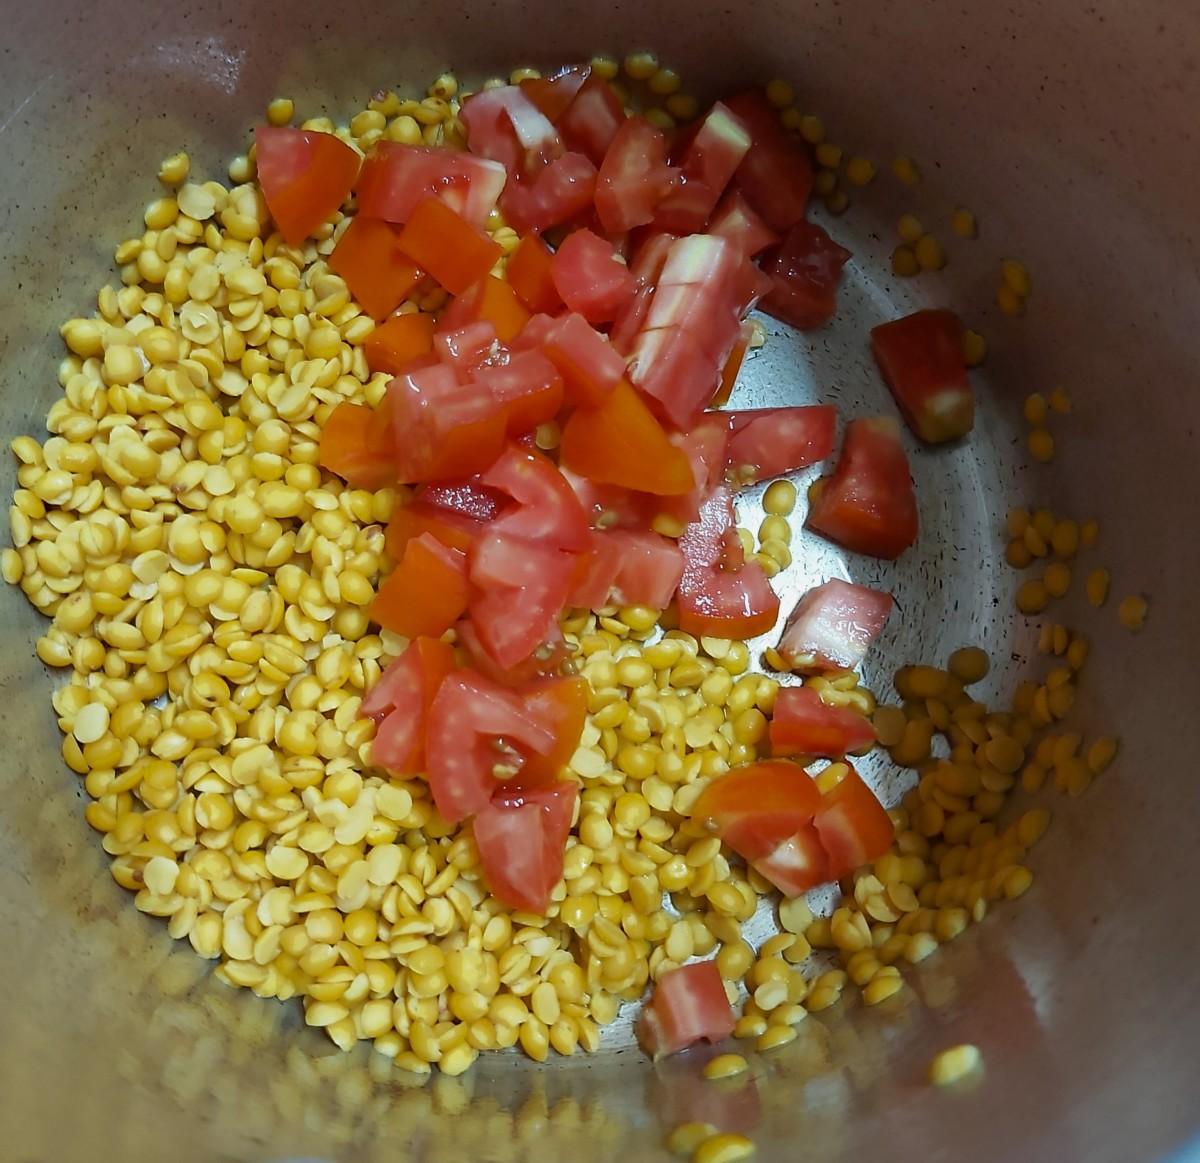 Add 1 to 2 chopped ripe tomatoes.